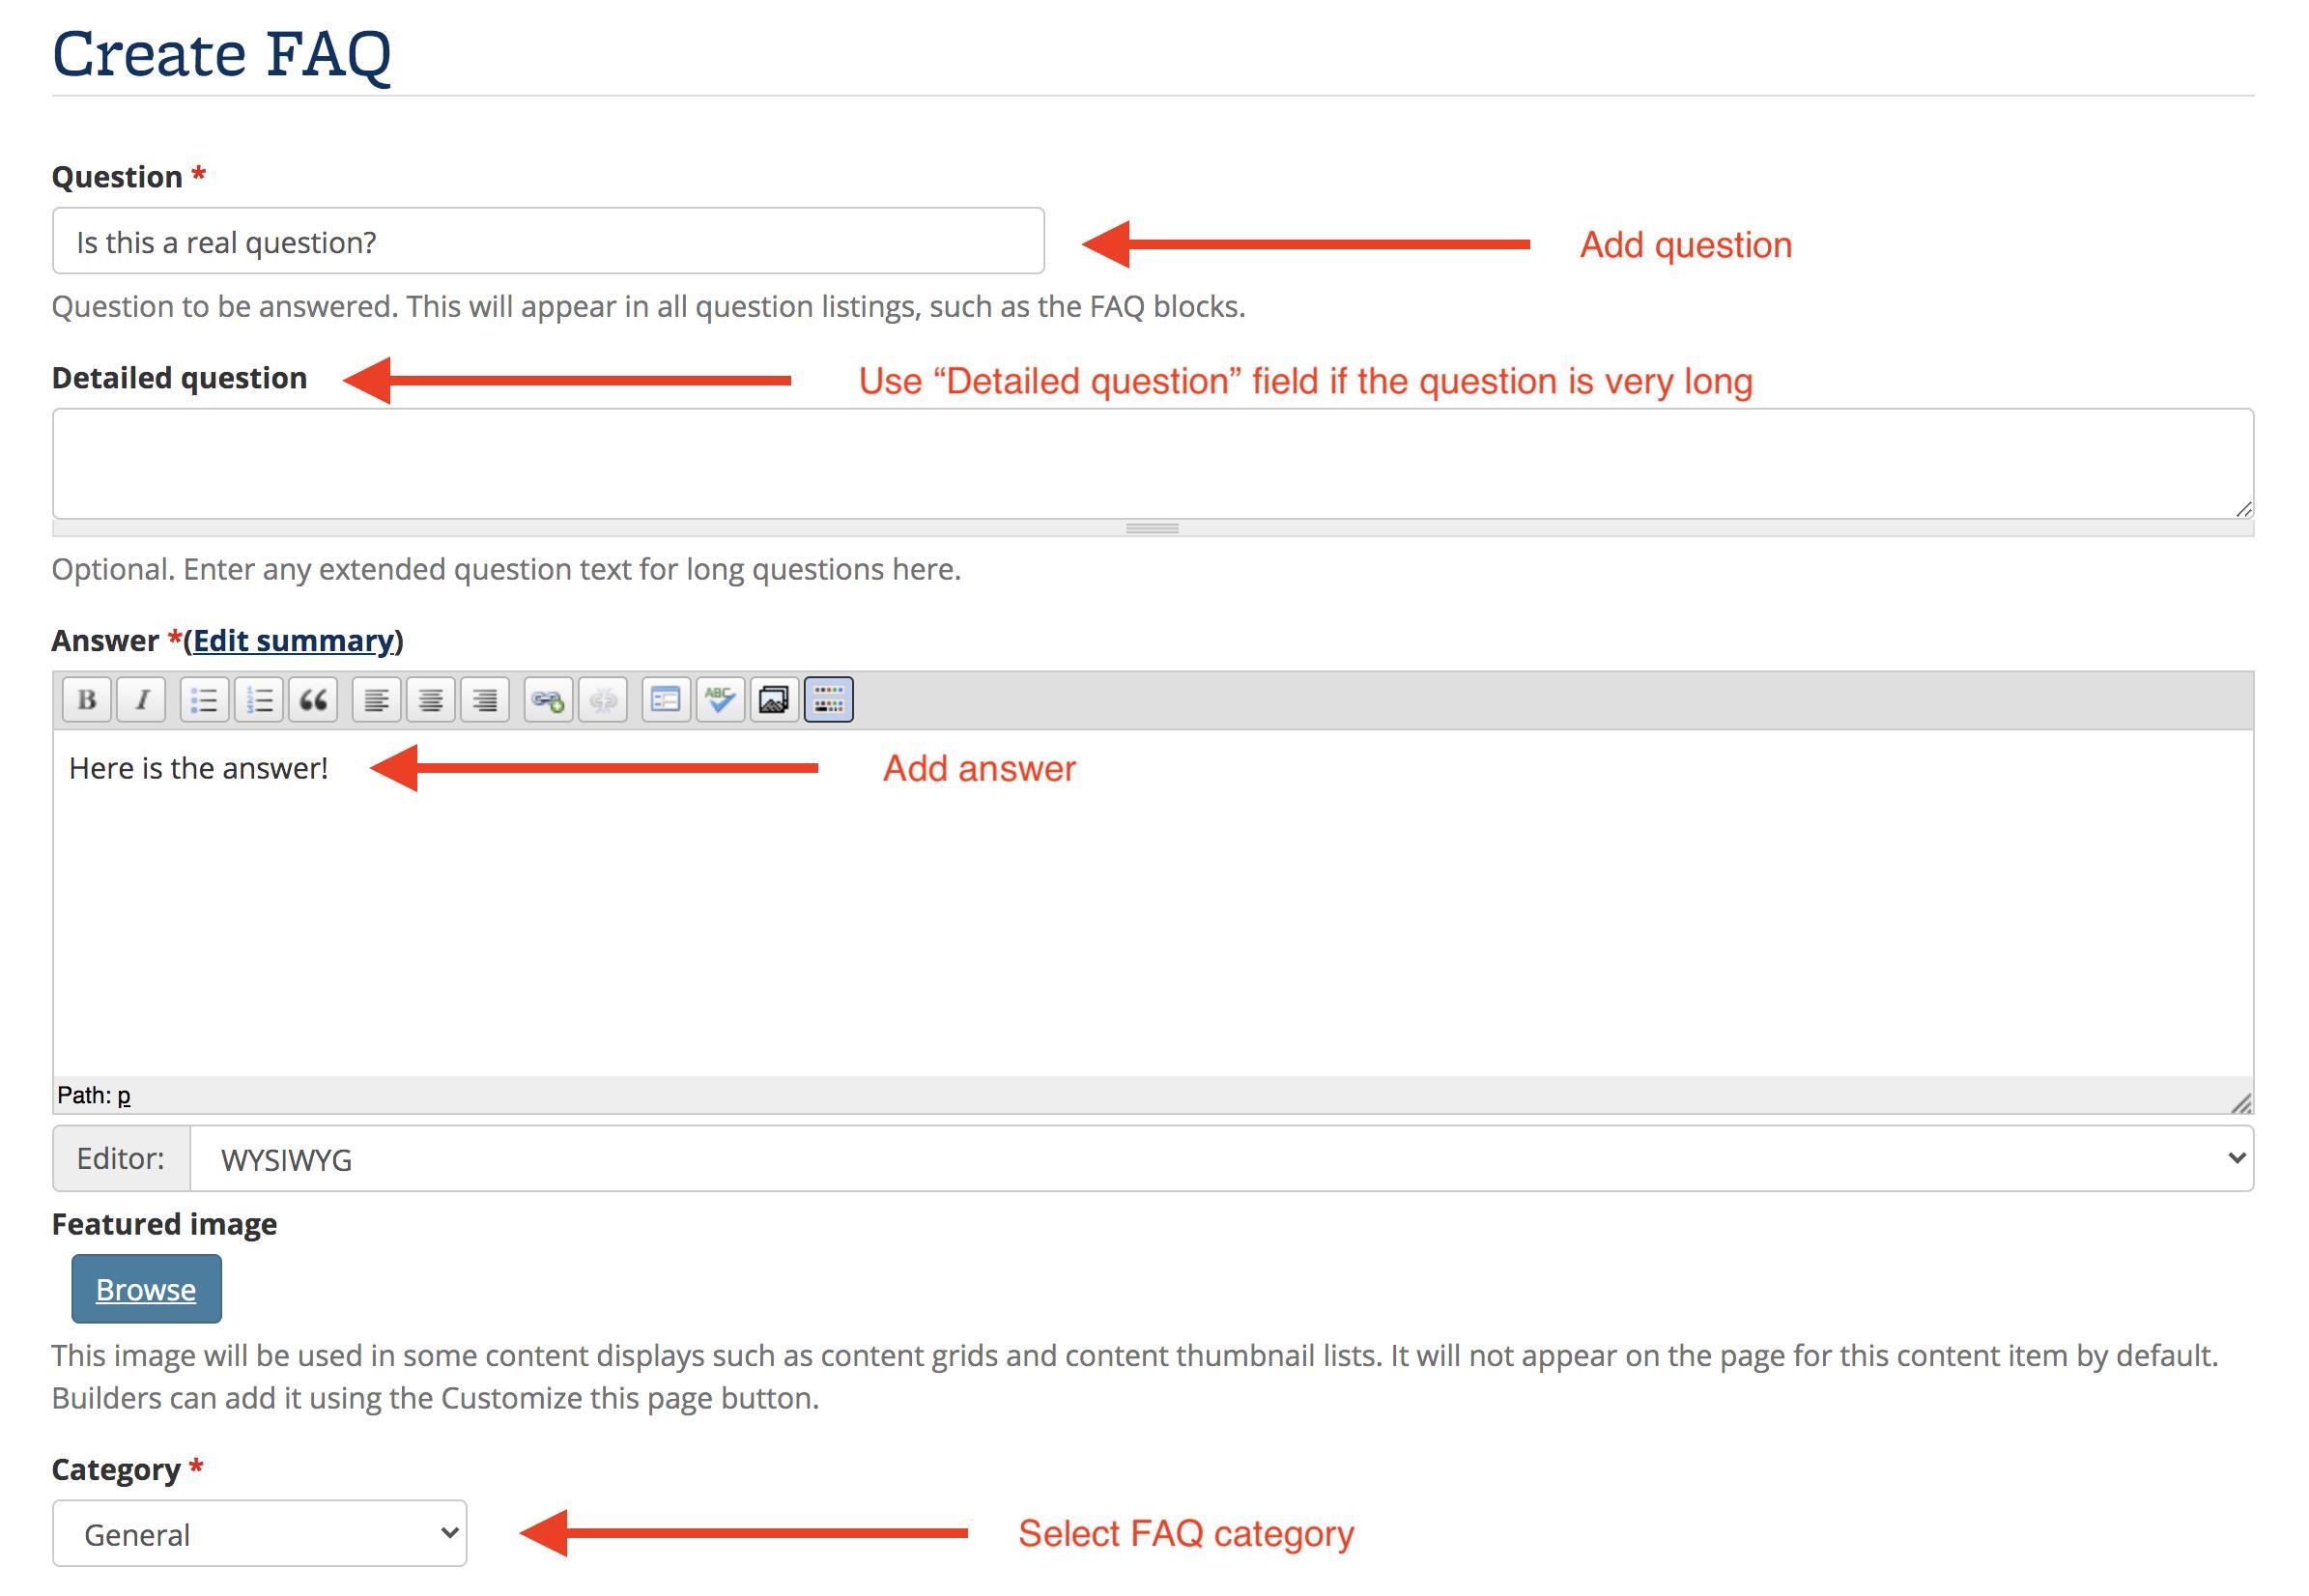 Screenshot of the Create FAQ editing interface